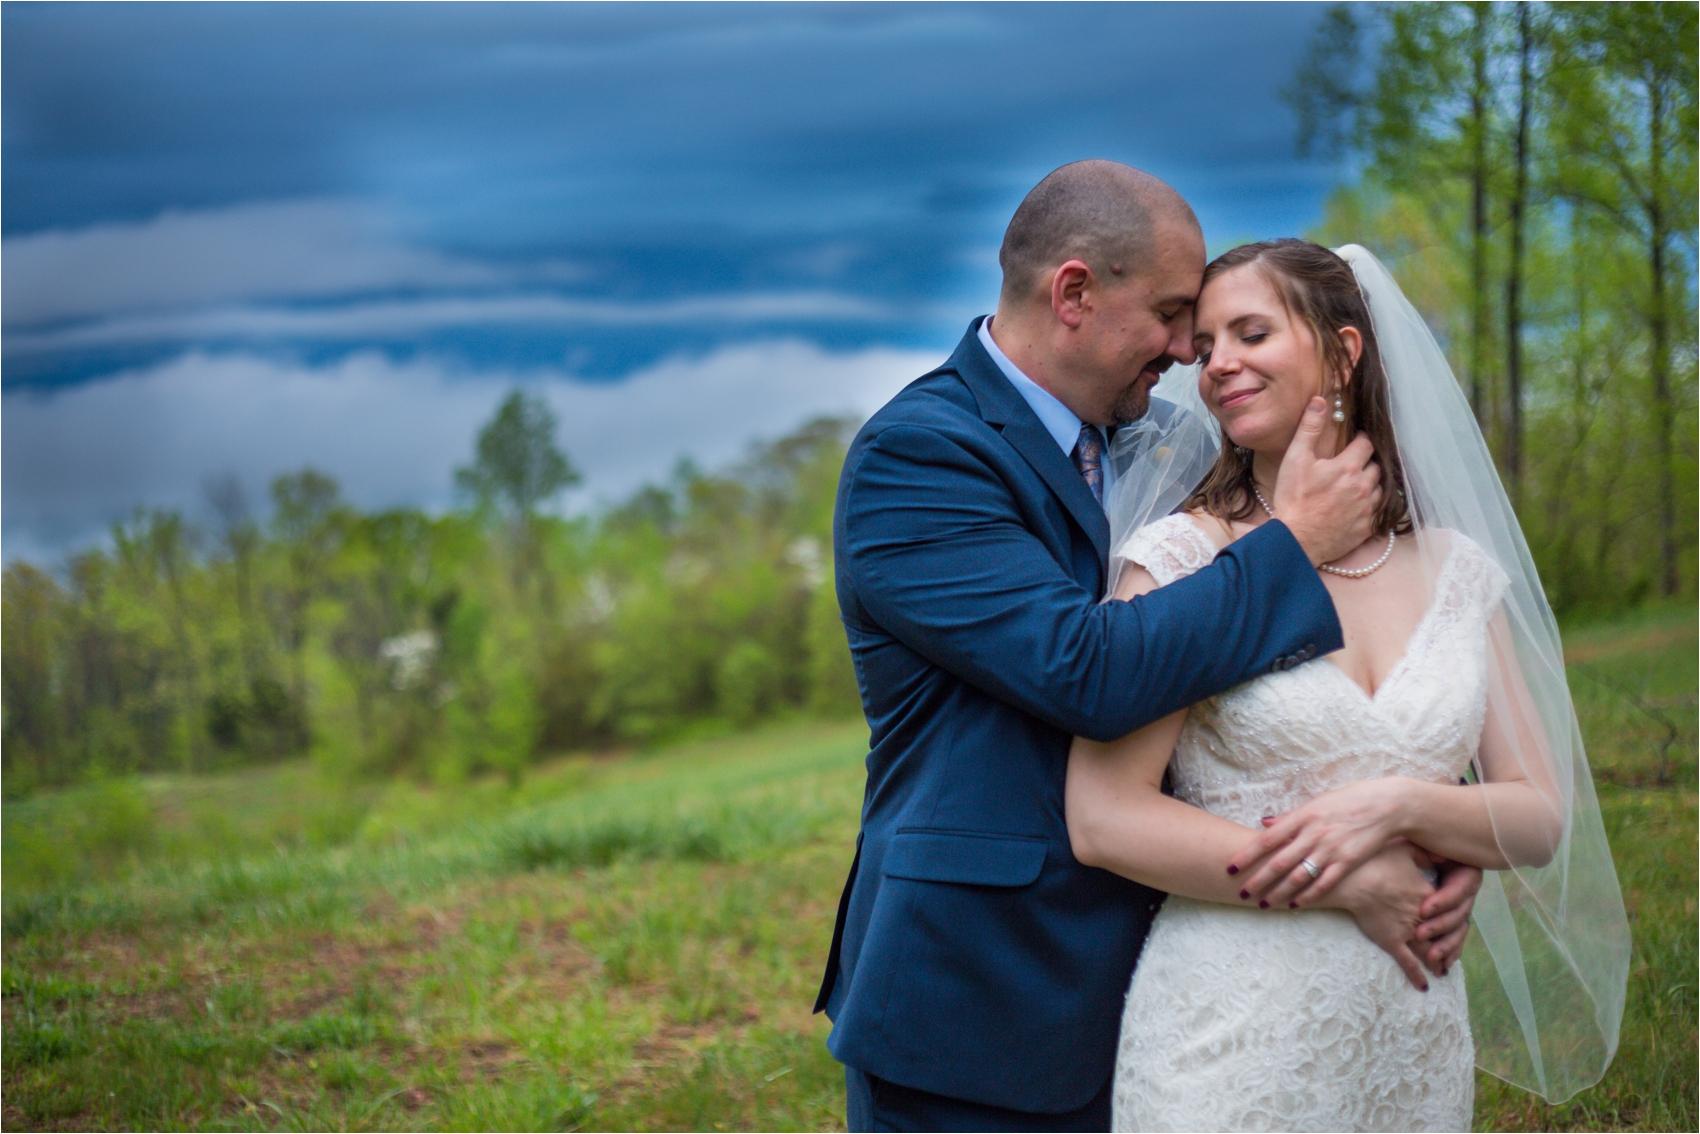 Lydia-Mountain-Spring-Virginia-Wedding-1250.jpg